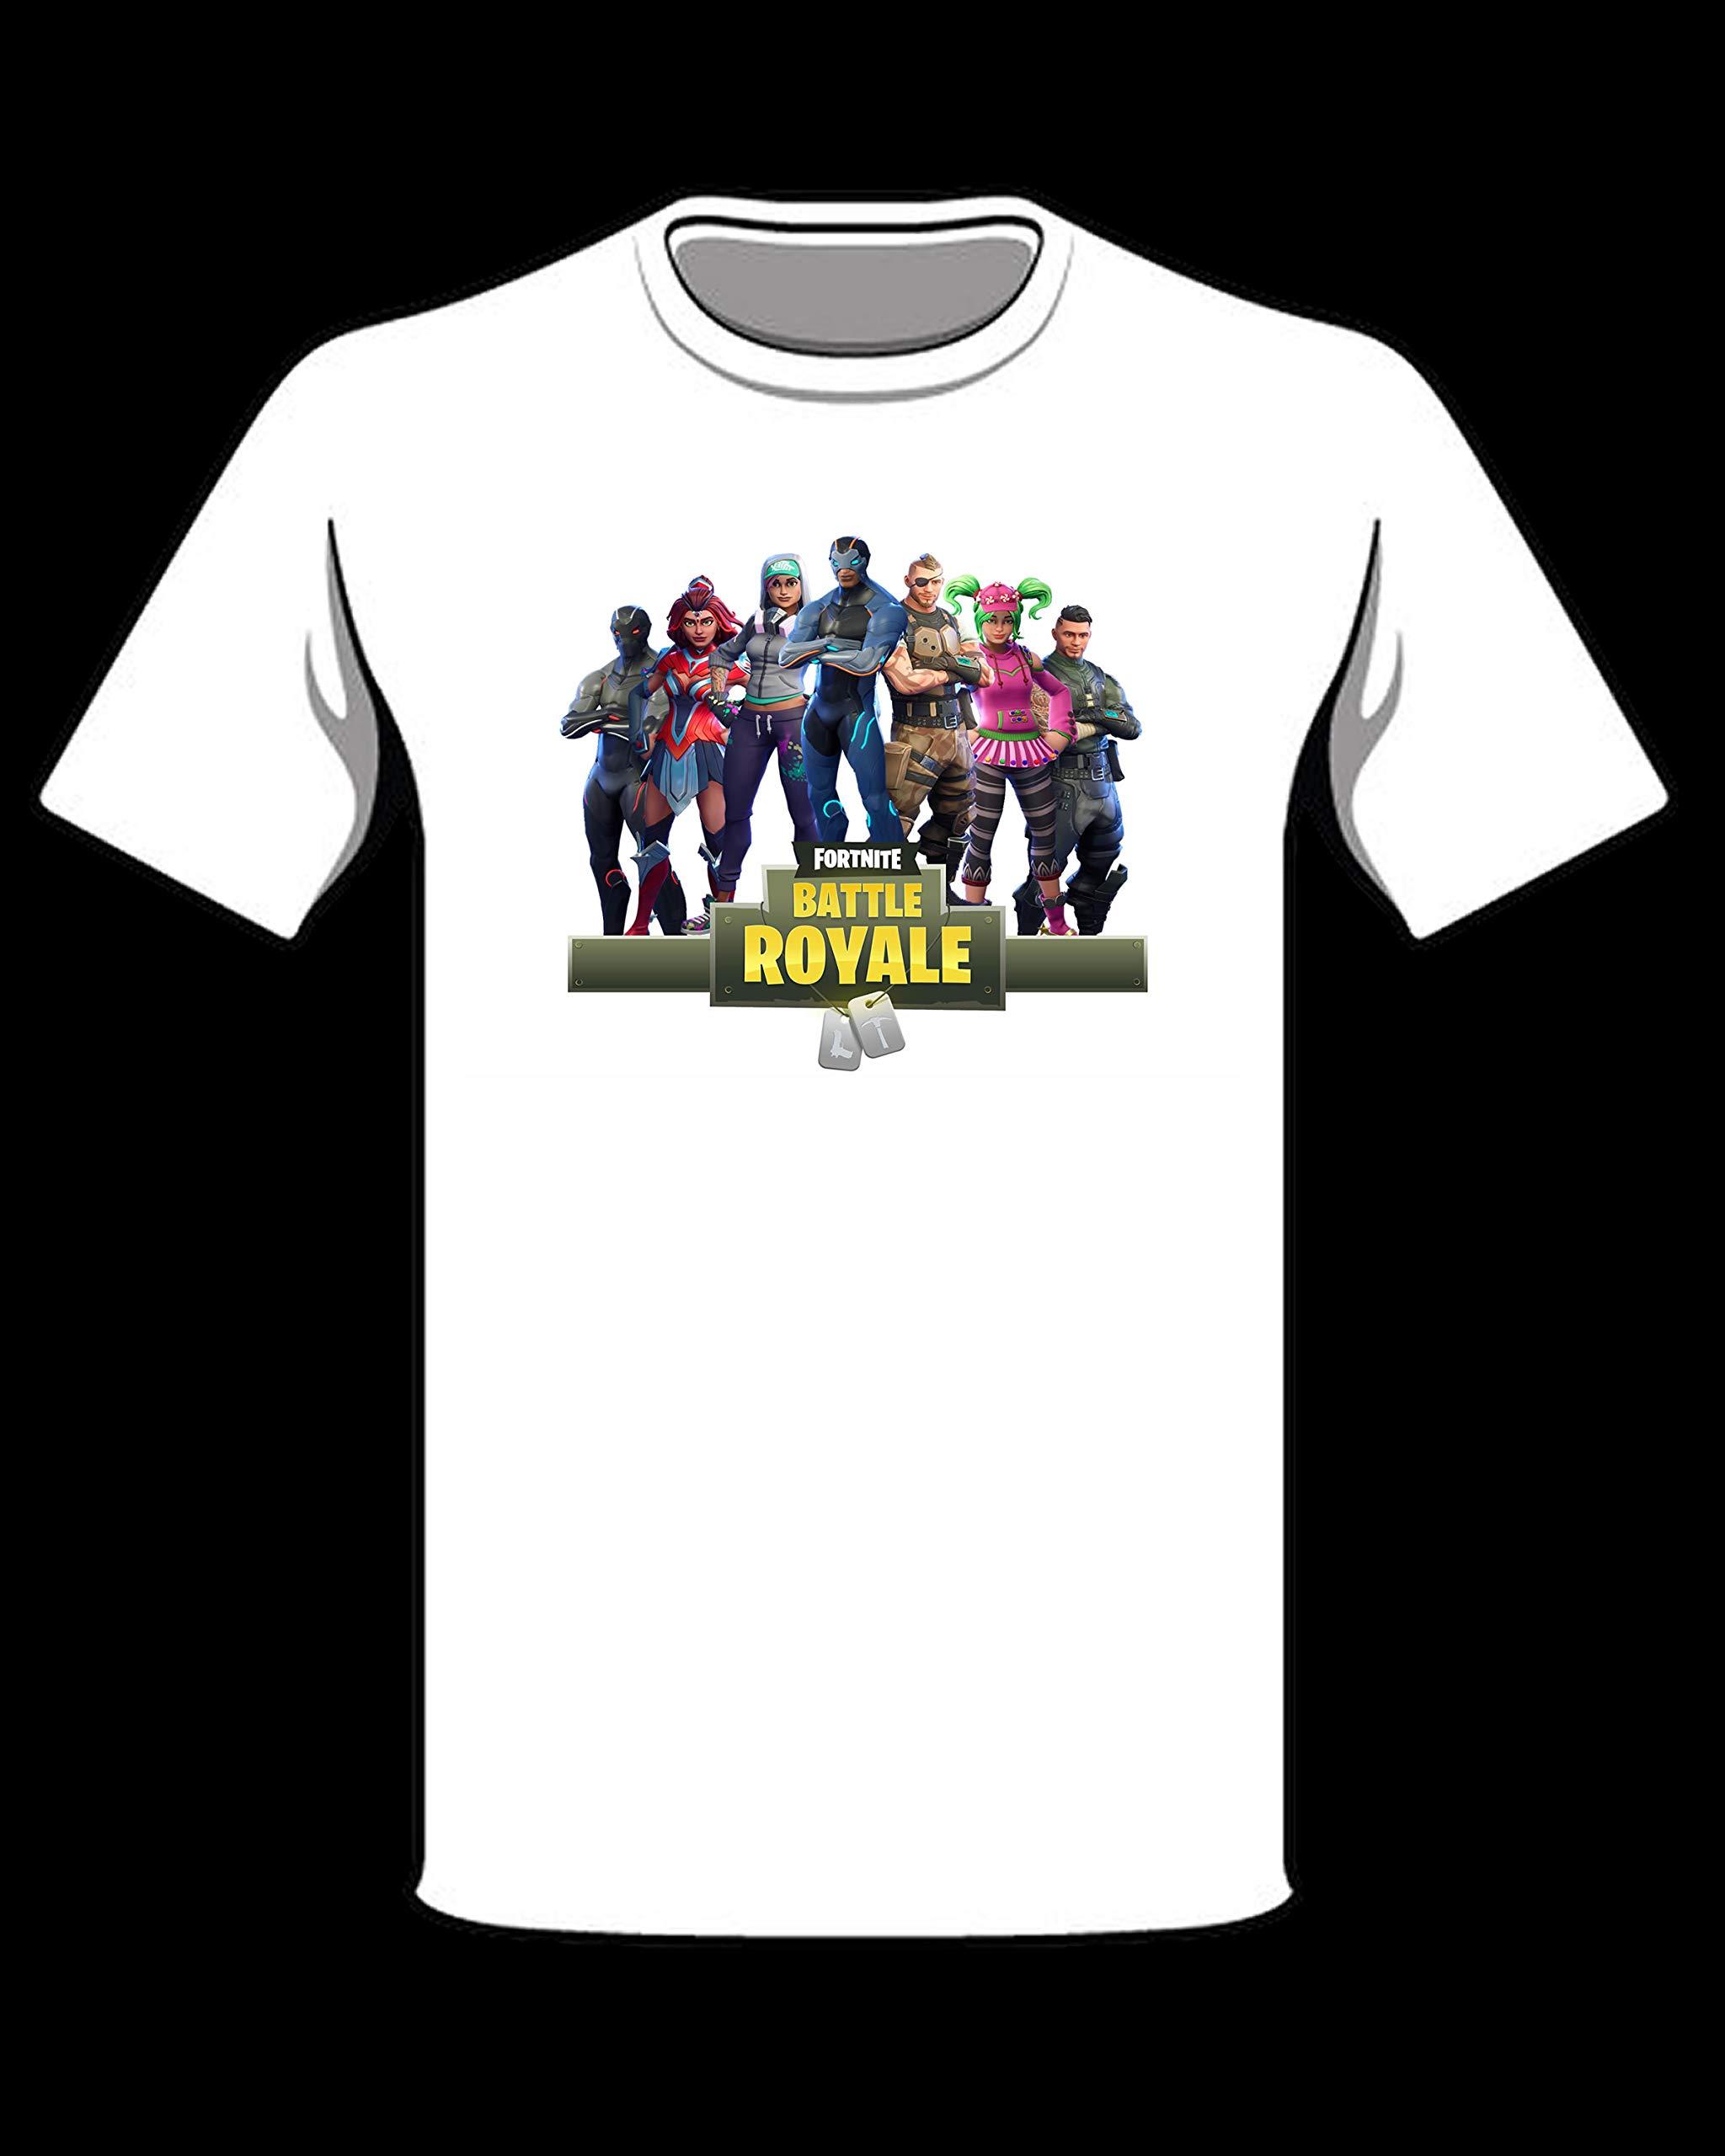 Fortnite season four Shirt, Fortnite birthday shirt #57